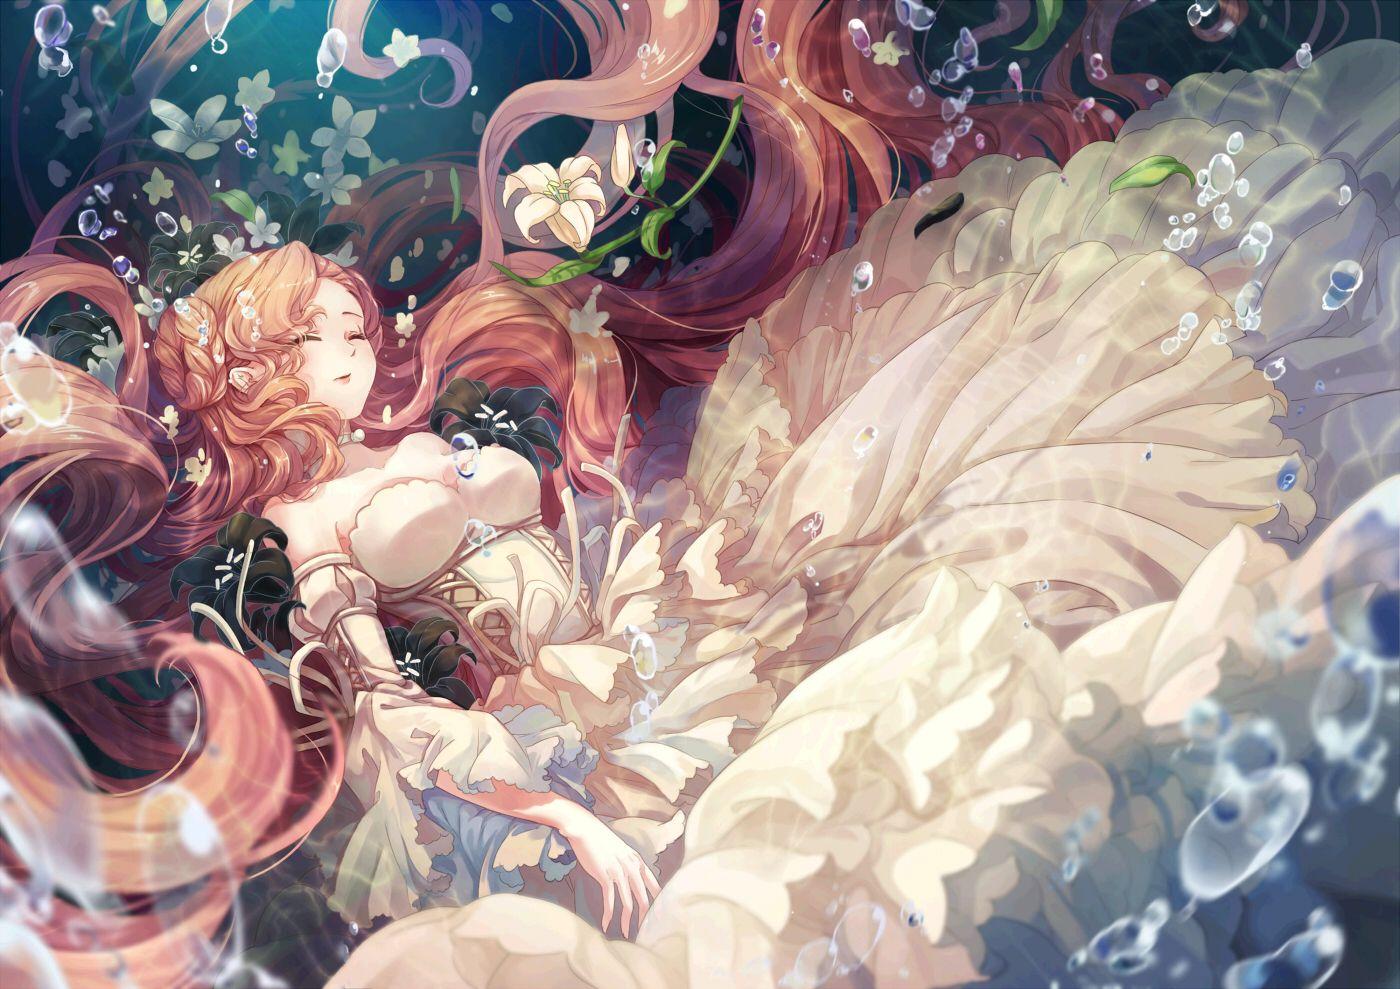 Breasts bubbles cat princess cleavage code geass dress euphemia li britannia flowers long hair pink hair sleeping underwater water anime artwork